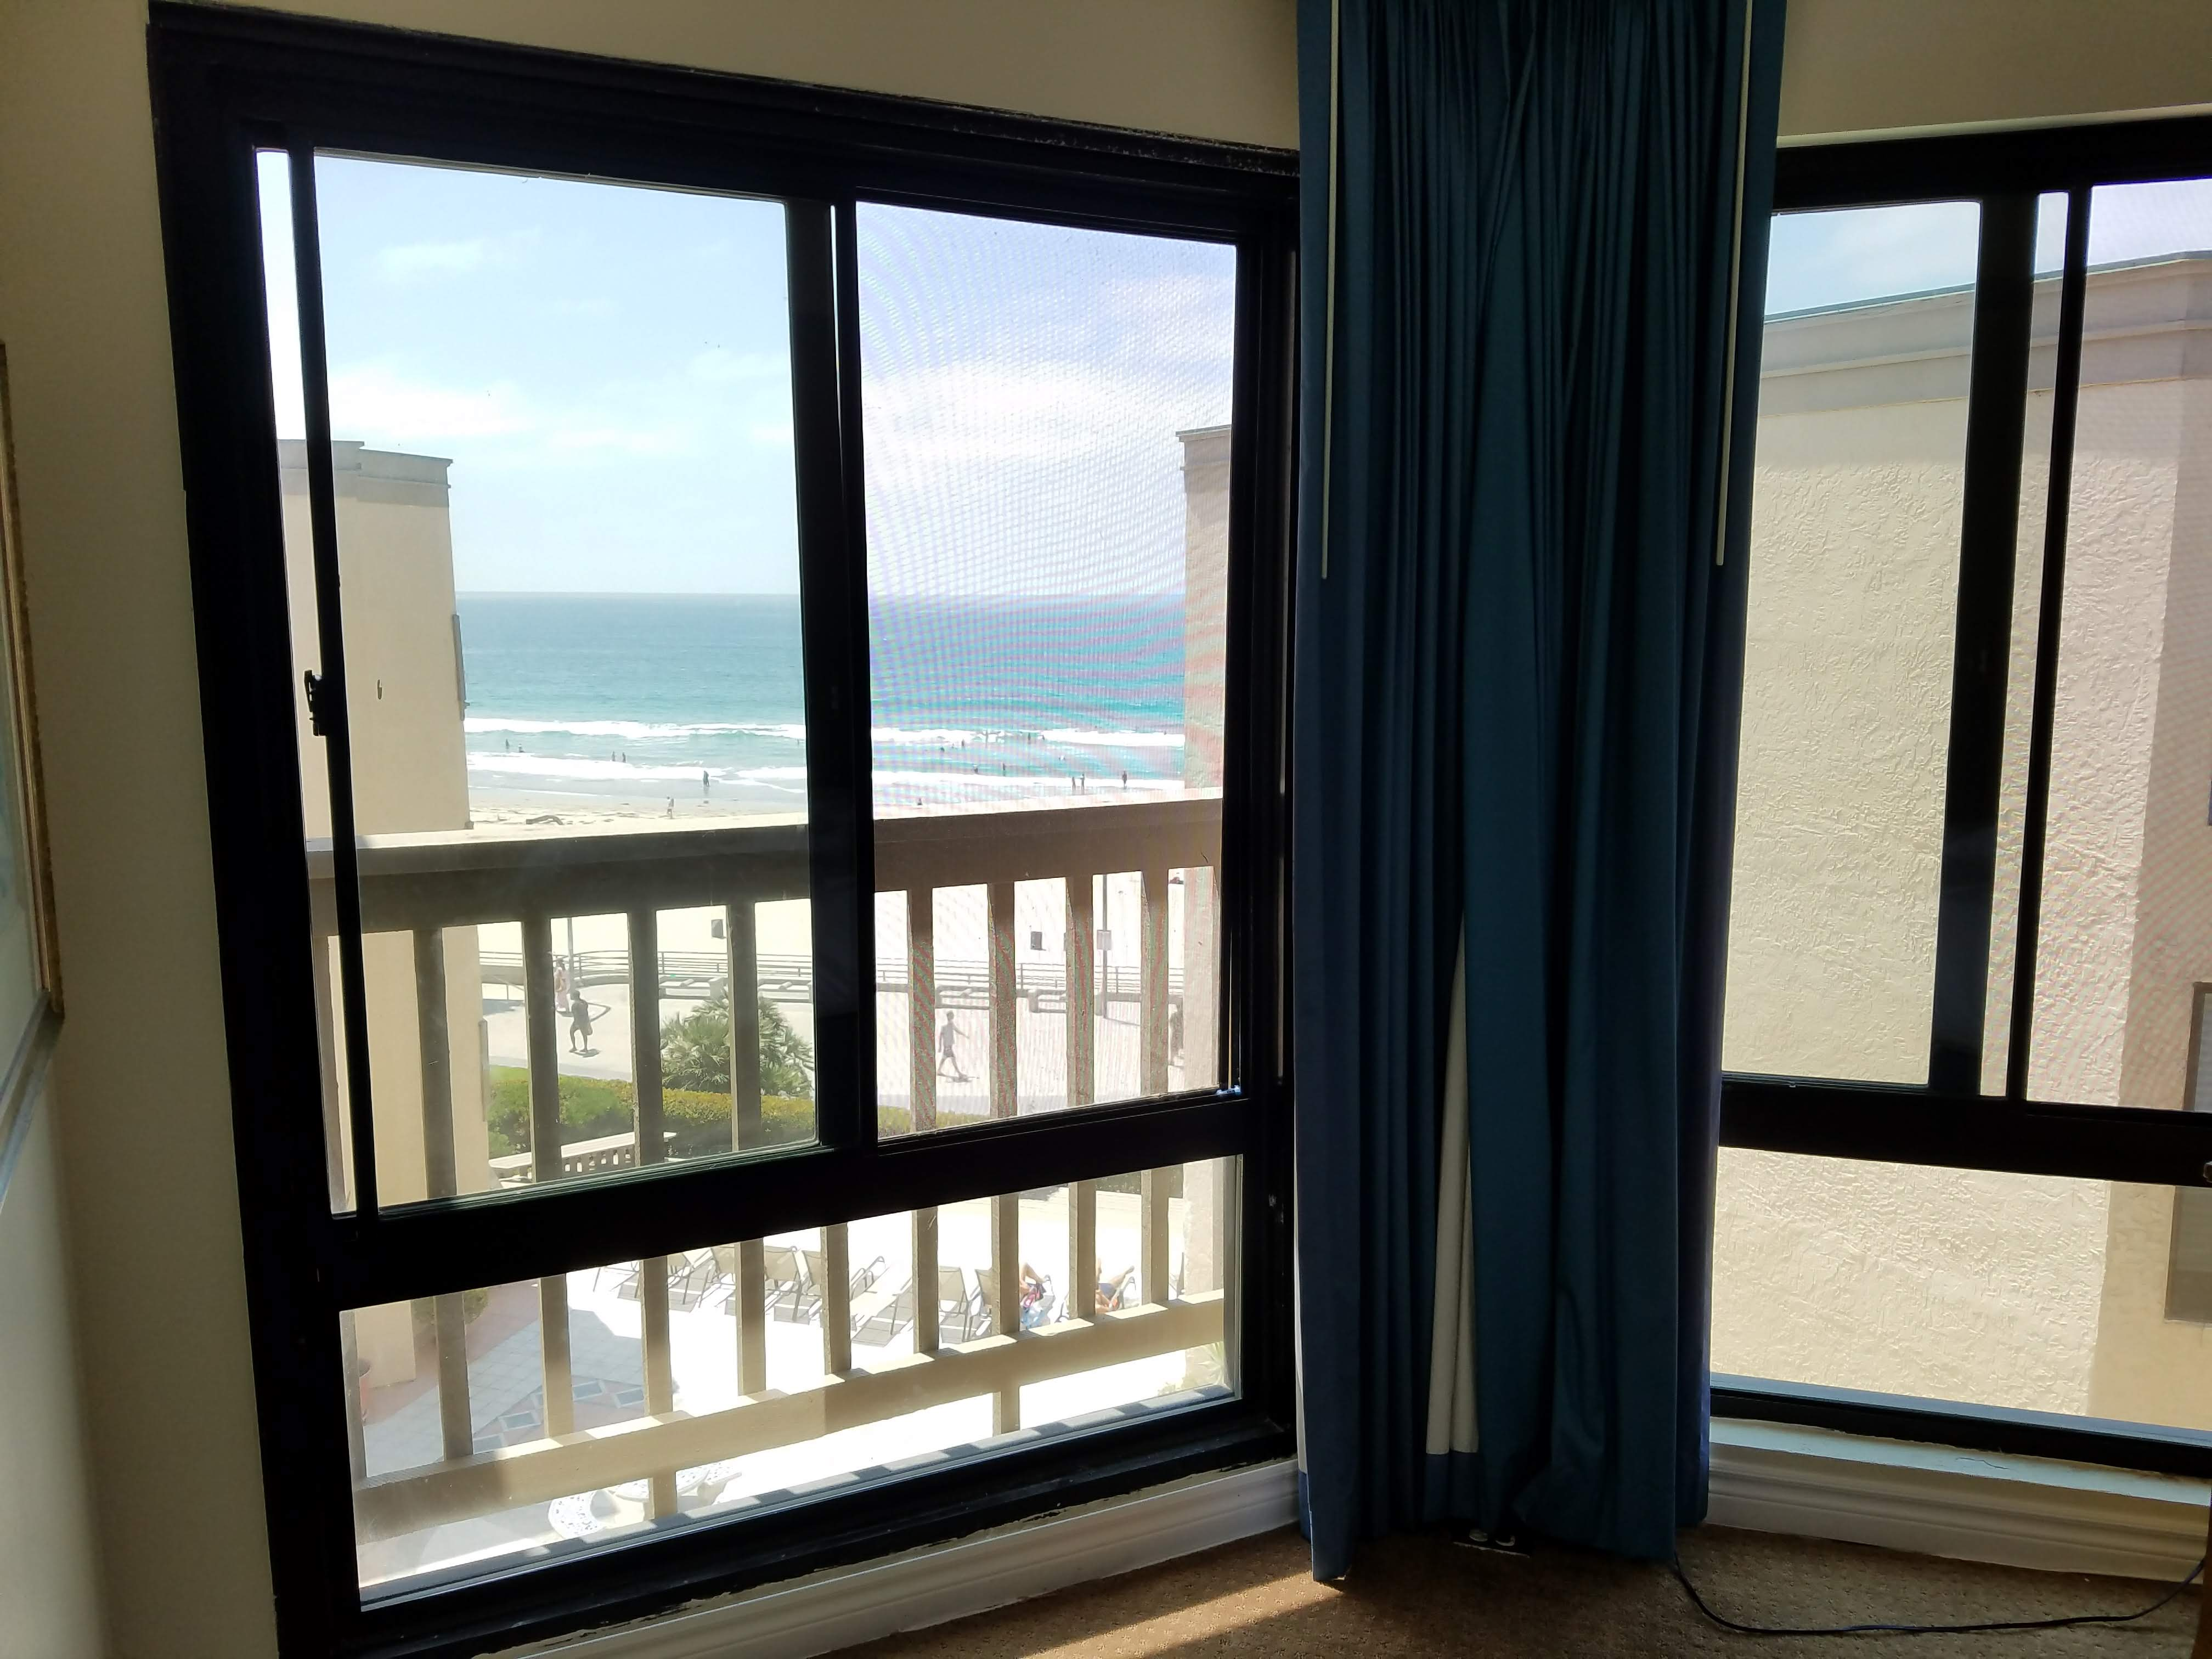 See the Sea at San Diego image